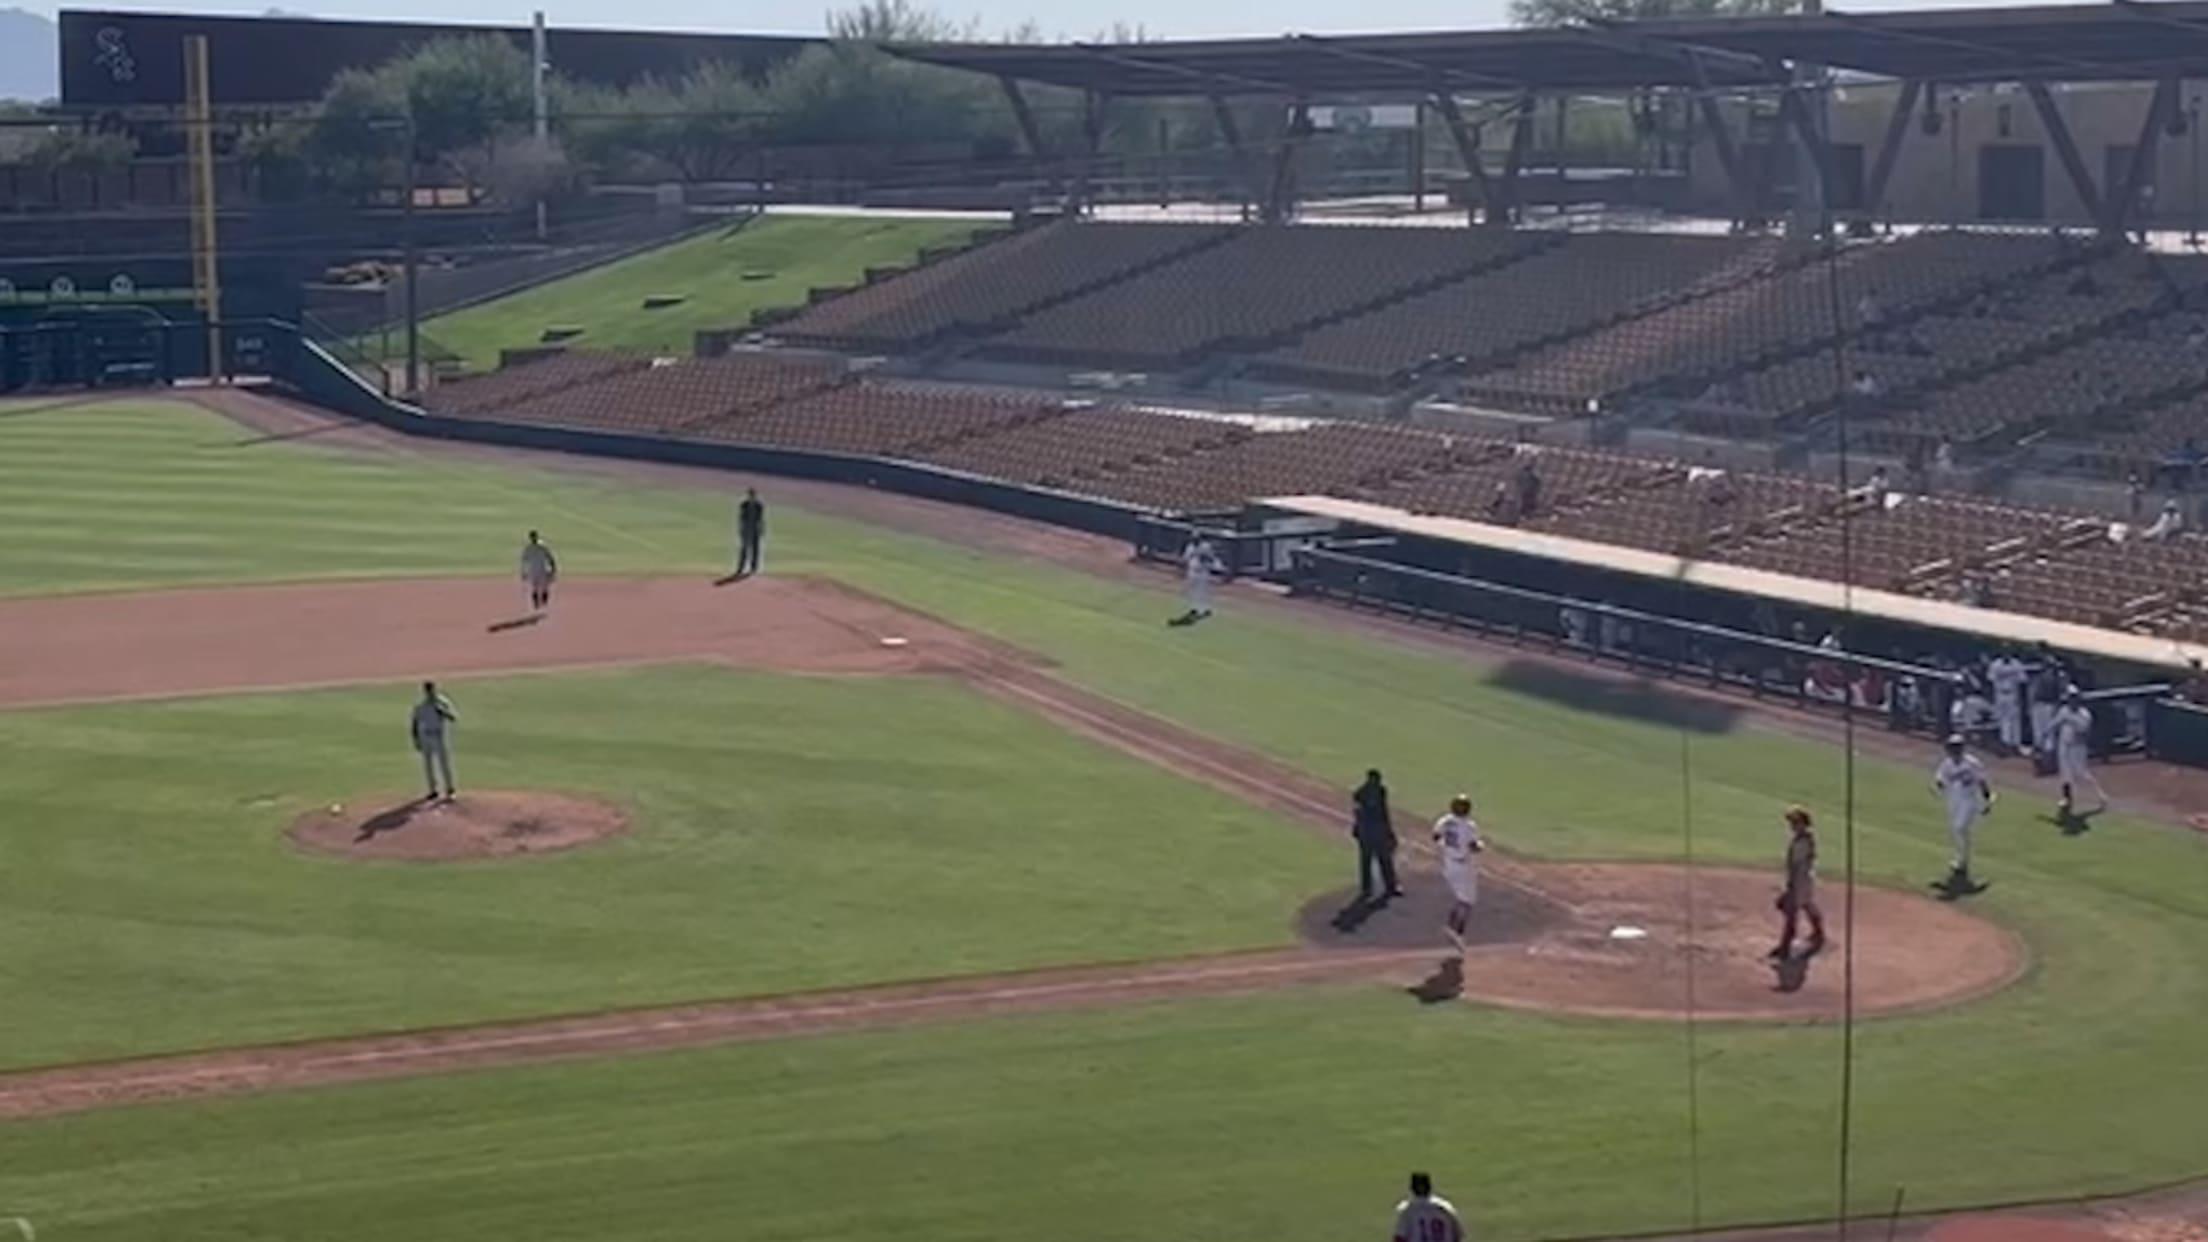 Juan Yepez's solo home run